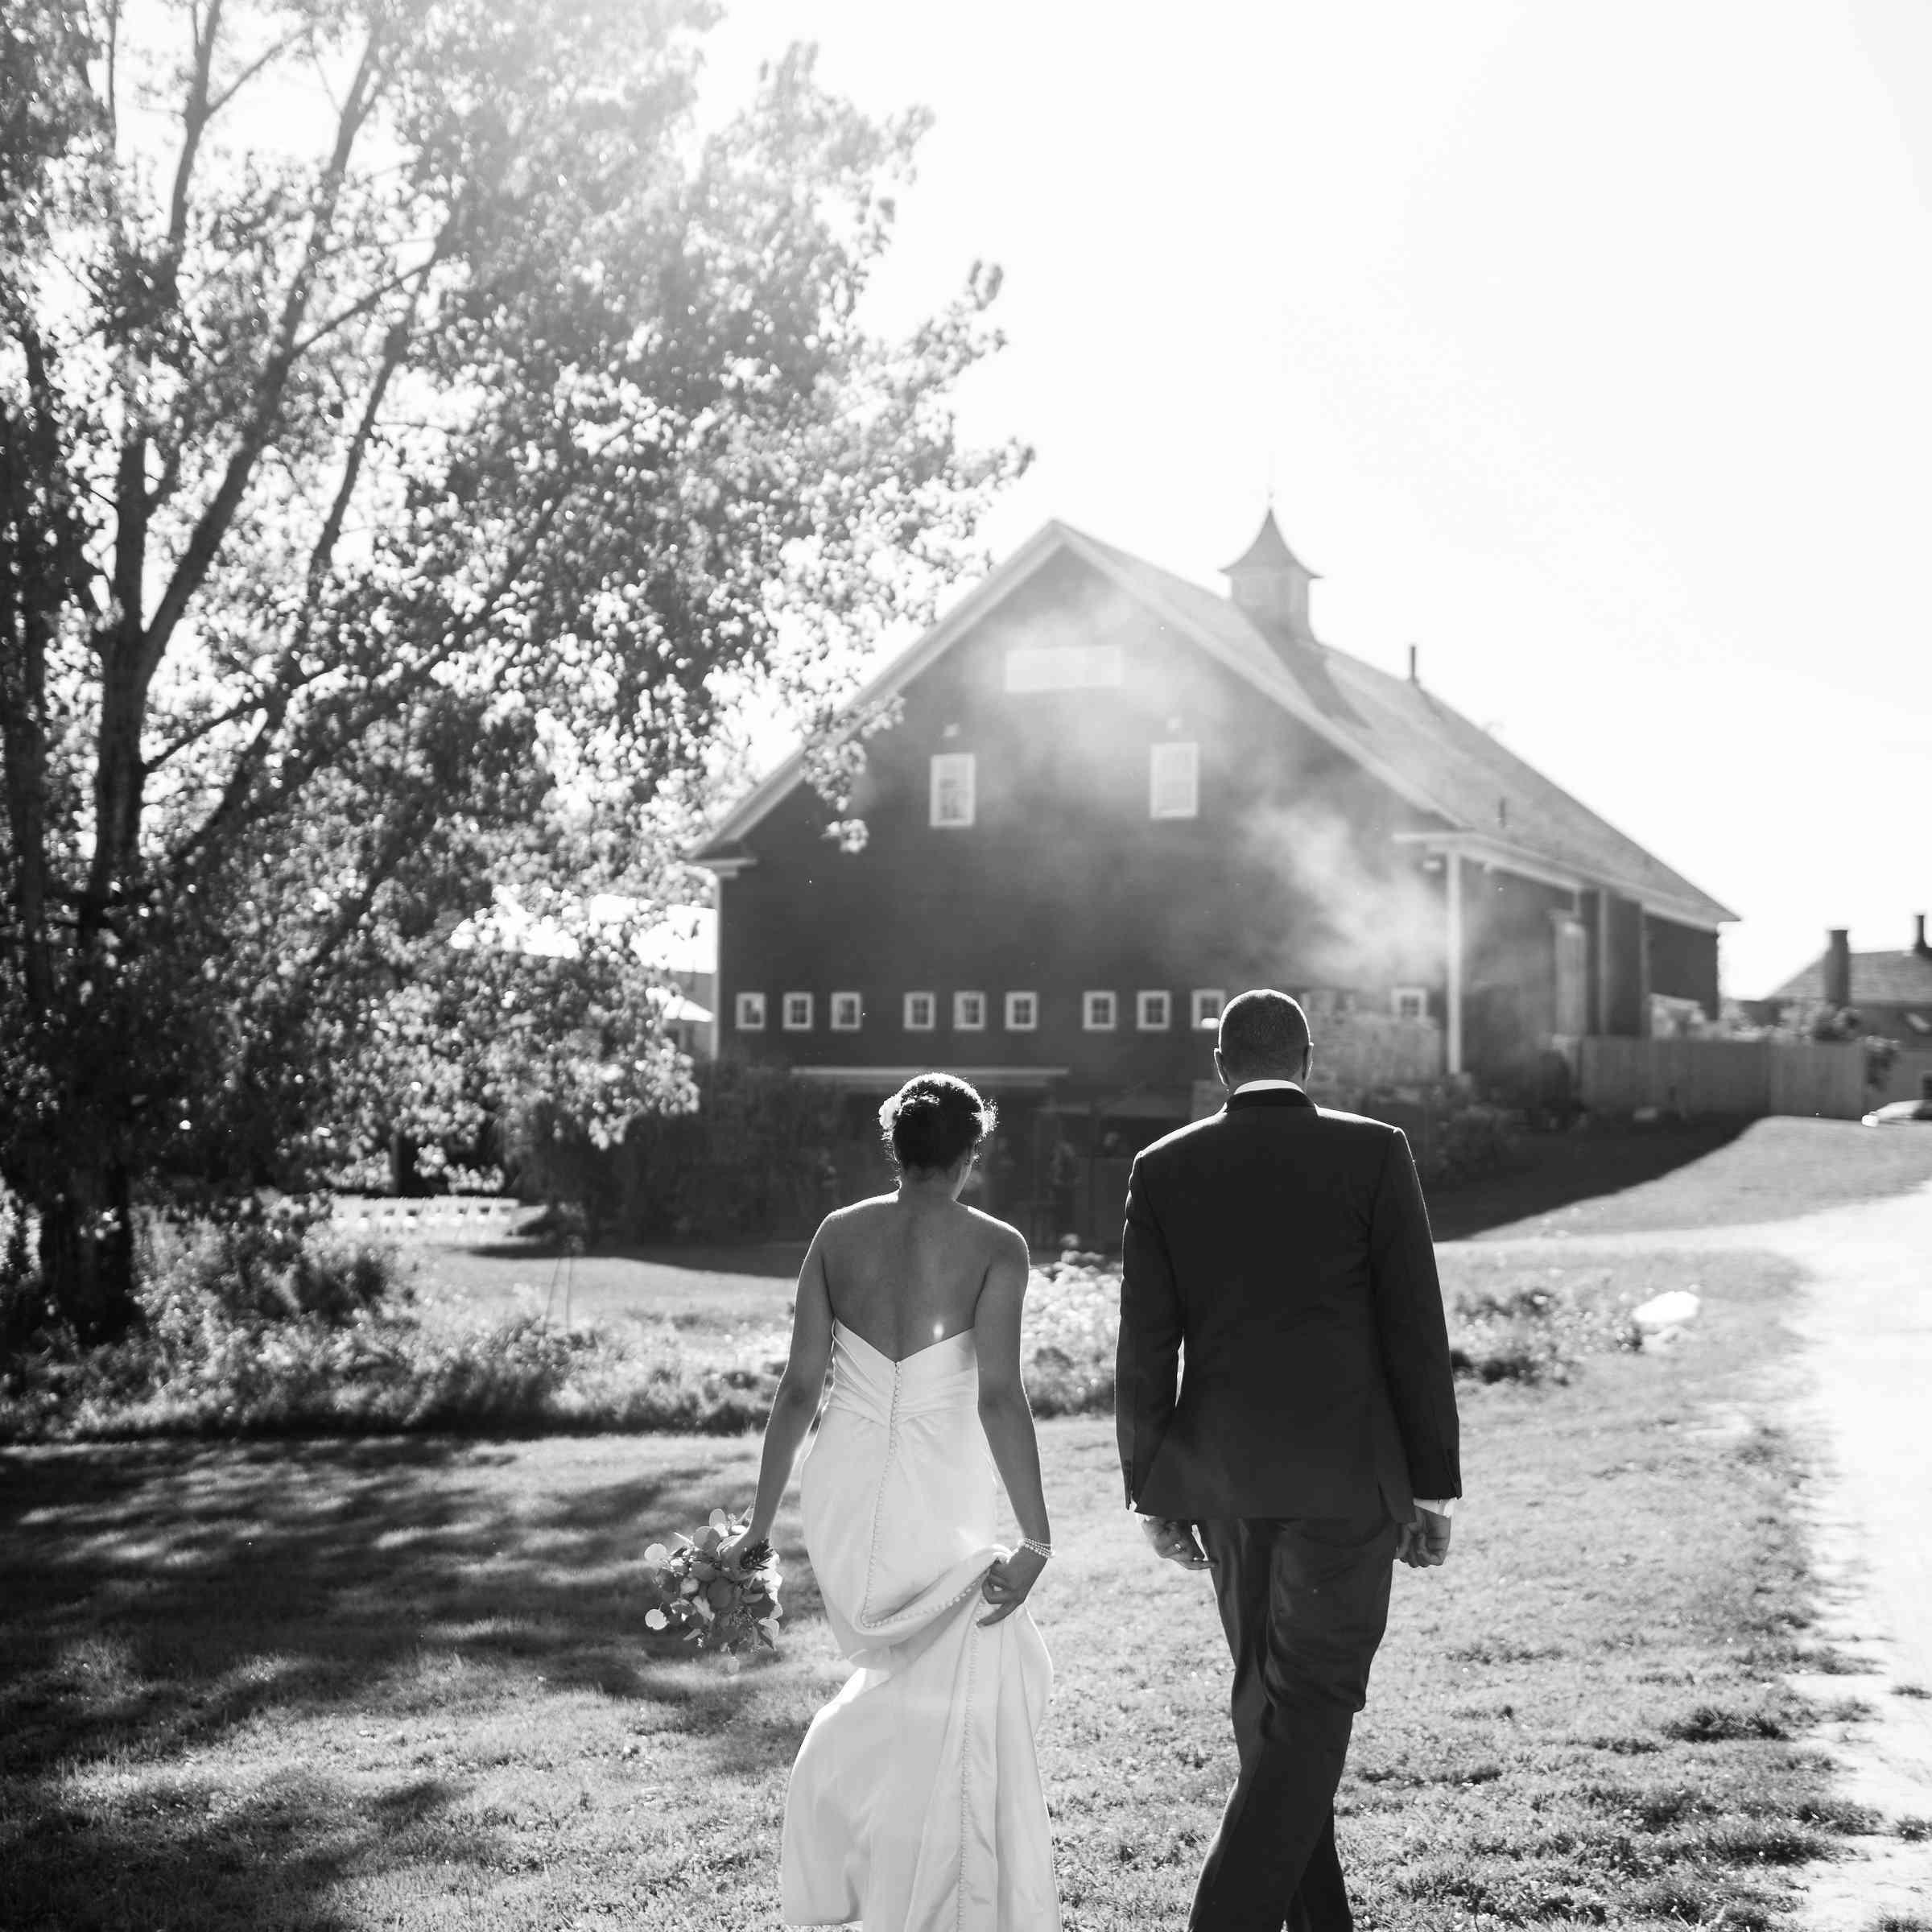 Bride and groom walking home